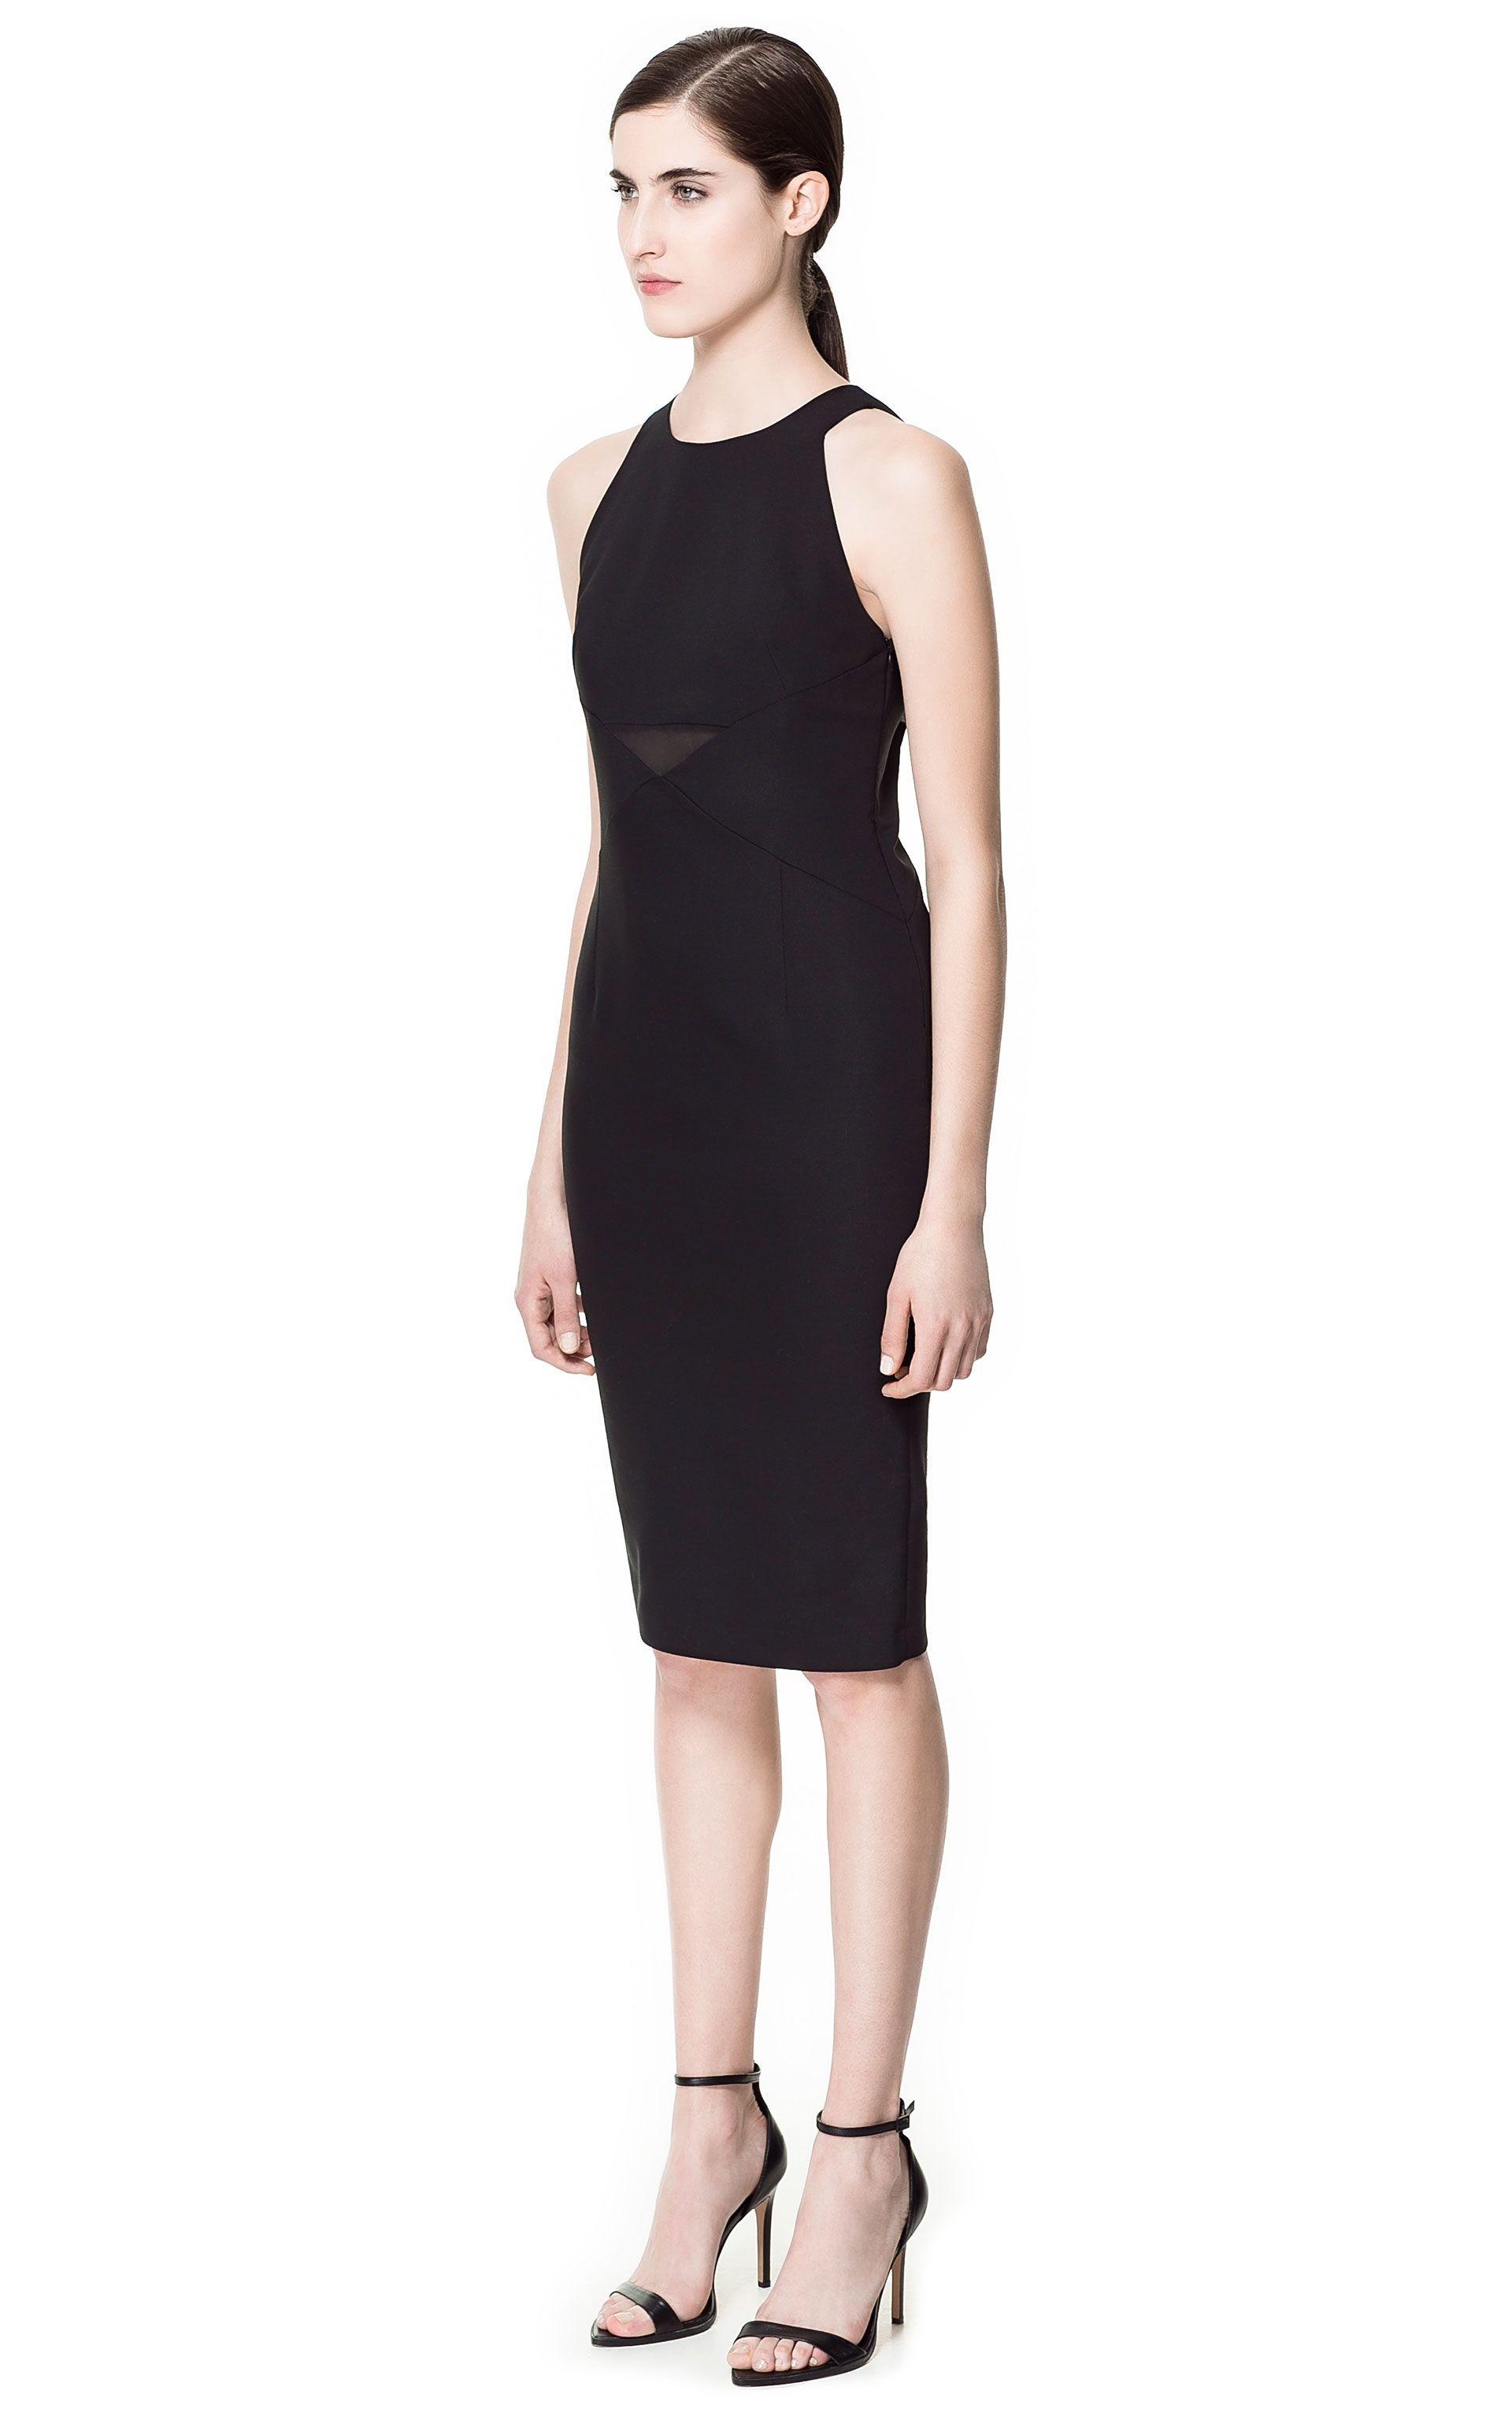 b652b6f325 COMBINED DRESS WITH SHEER DETAILS - Dresses - Woman | ZARA Italy - nice  basic black dress